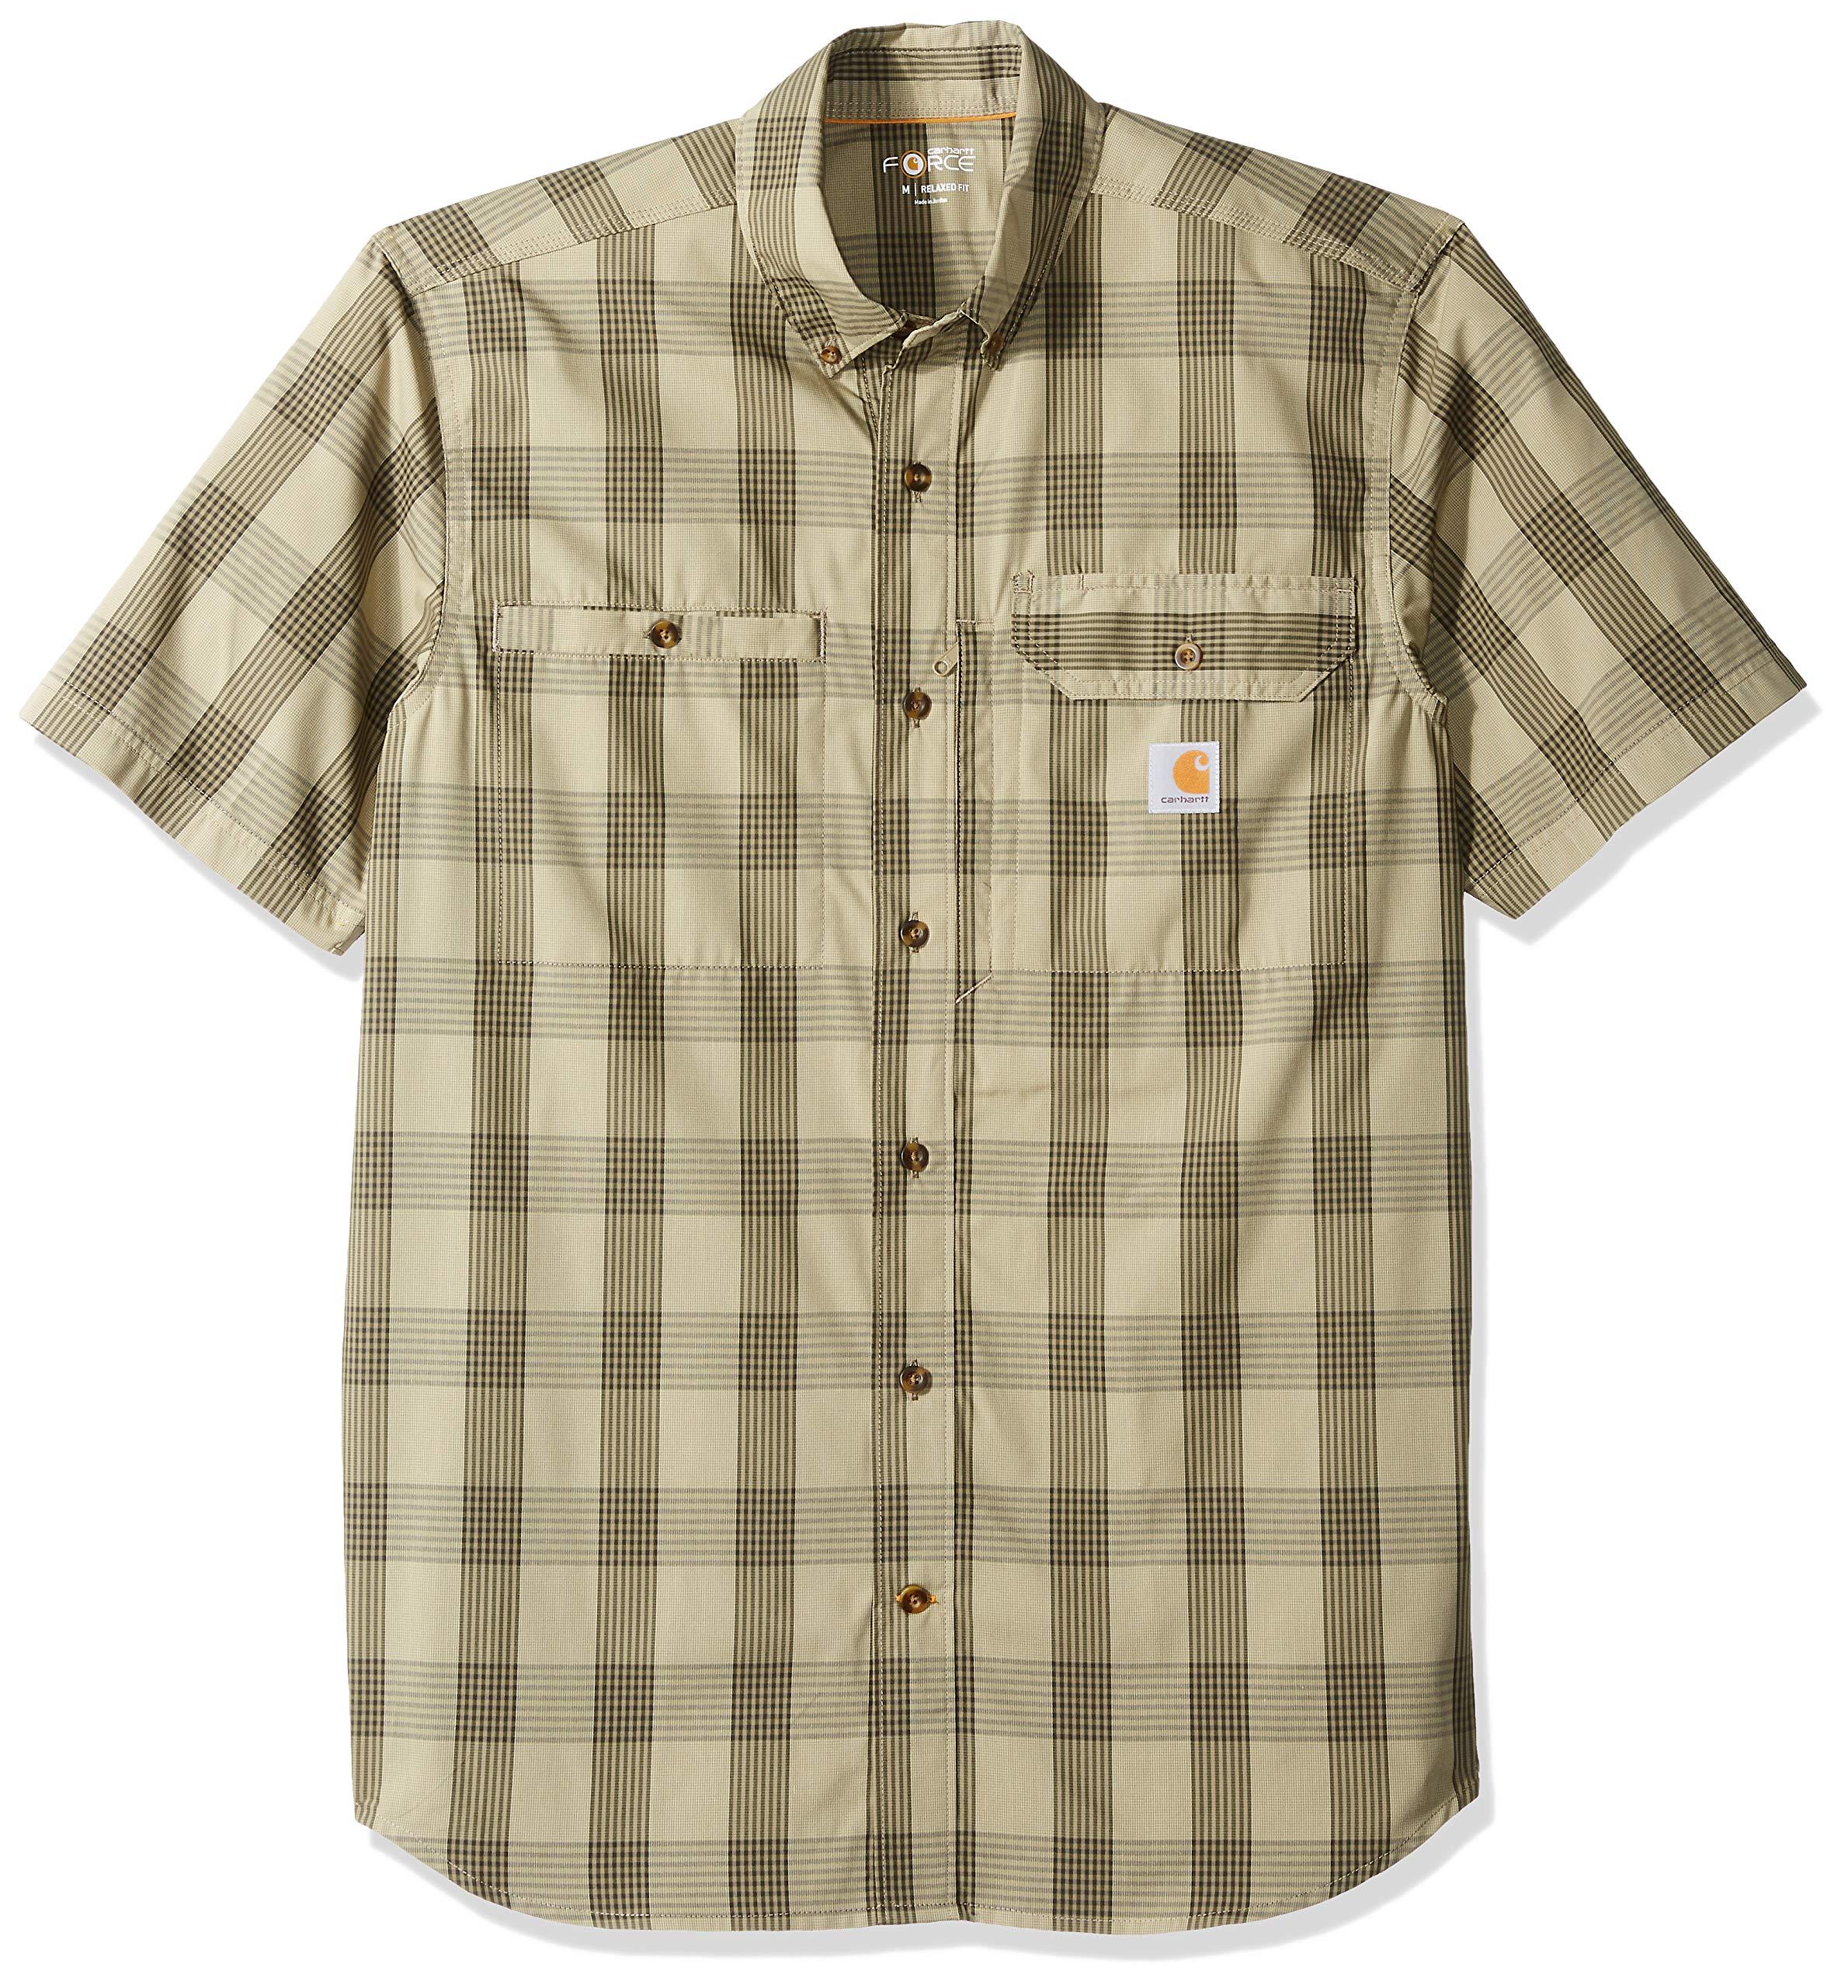 Carhartt Men's Force Plaid Ridgefield Short Sleeve Shirt (Regular and Big & Tall Sizes), Burnt Olive, X-Large